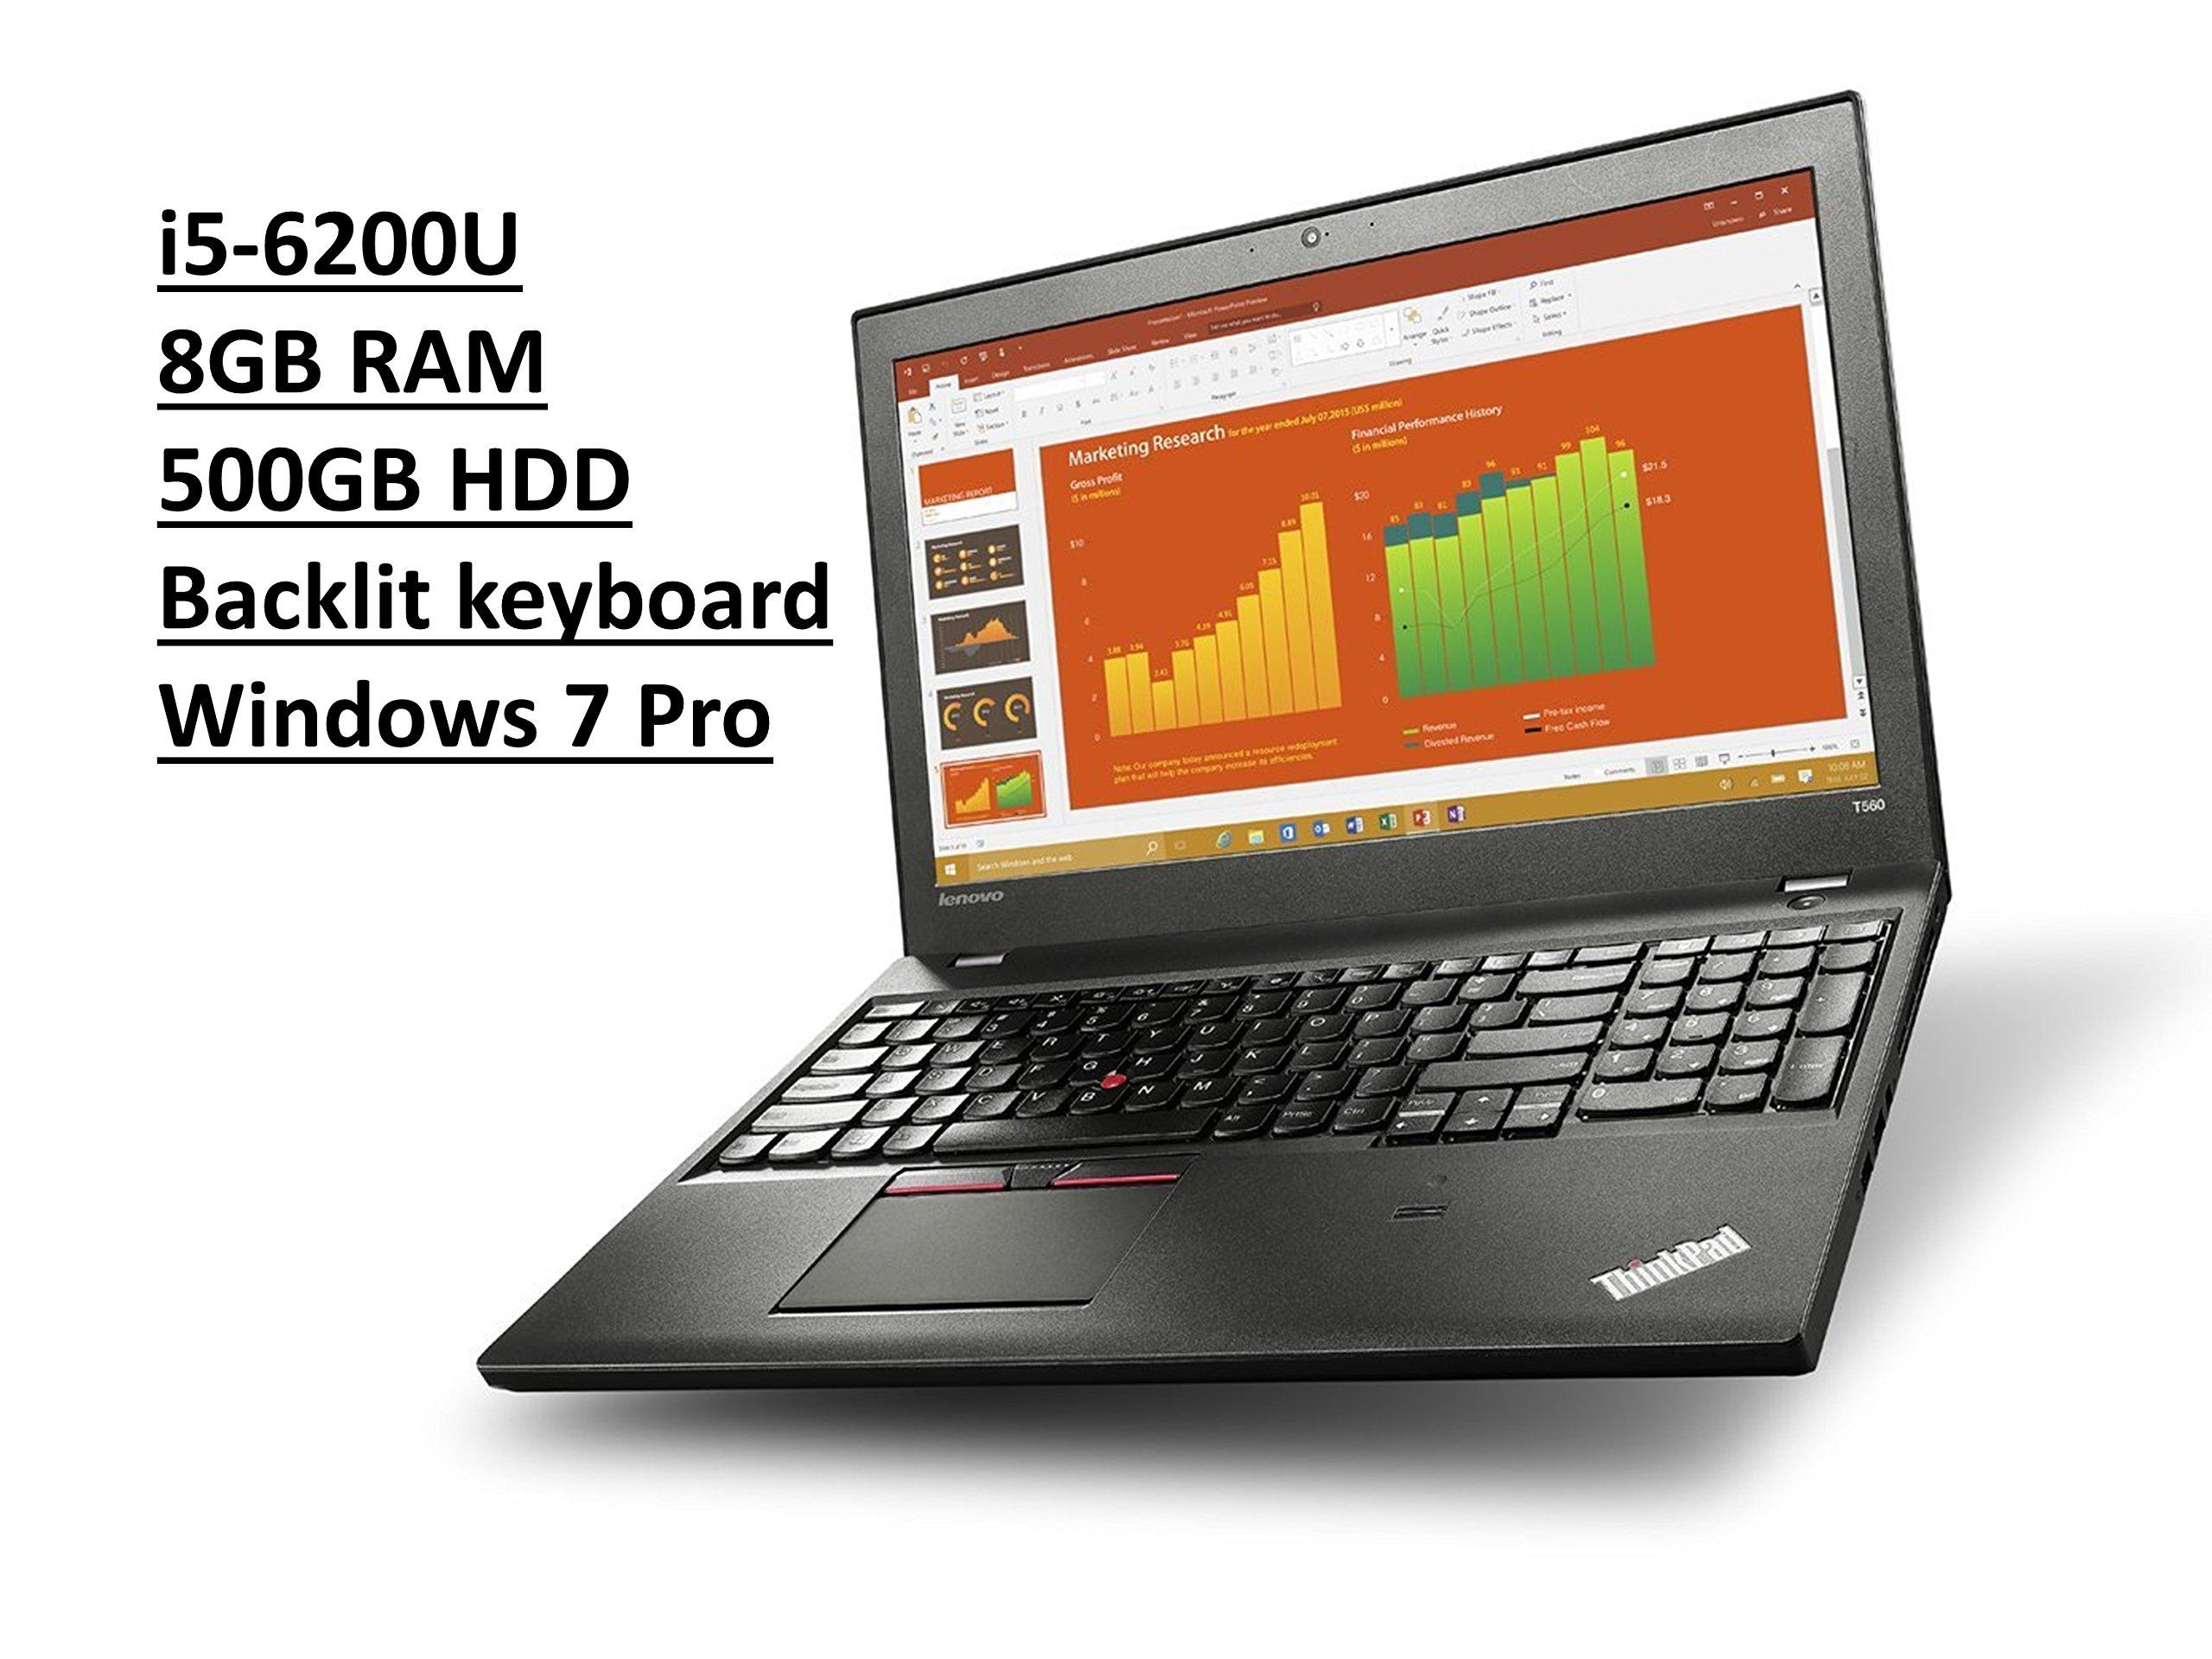 Lenovo ThinkPad T560 20FH 15.6'' Business Laptop: Intel Core i5-6200U | 8GB RAM | 500GB HDD | Backlit Keyboard | FingerPrint Reader | Windows 7 Professional upgradeable to Windows 10 Pro